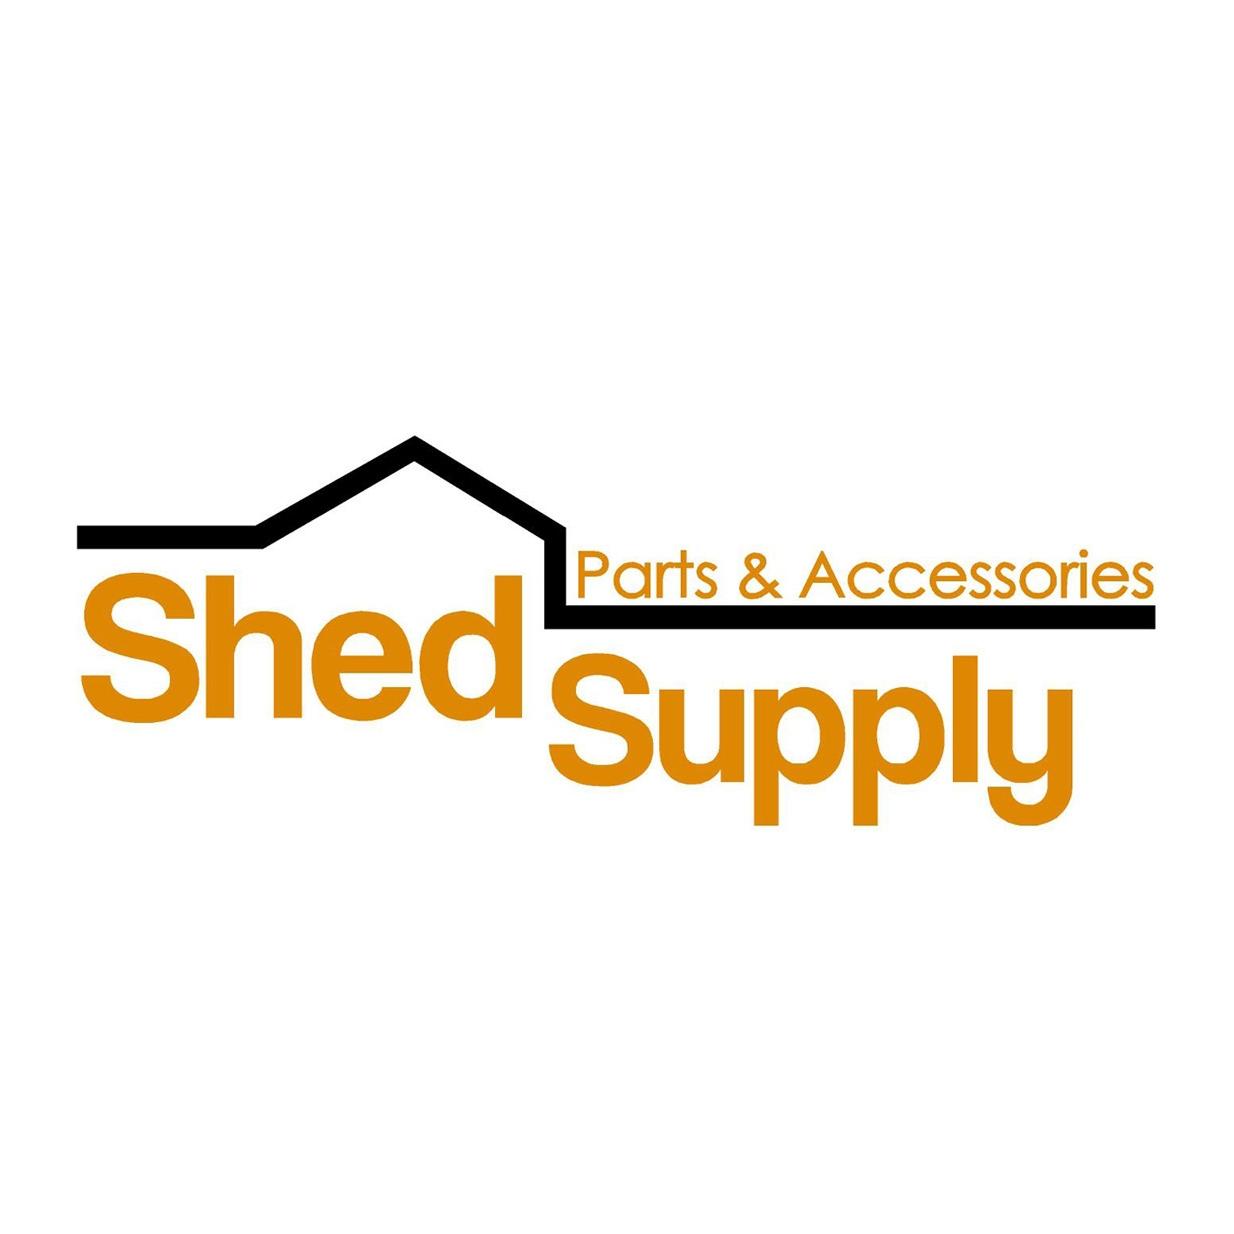 Shed Supply2 2.0.jpg